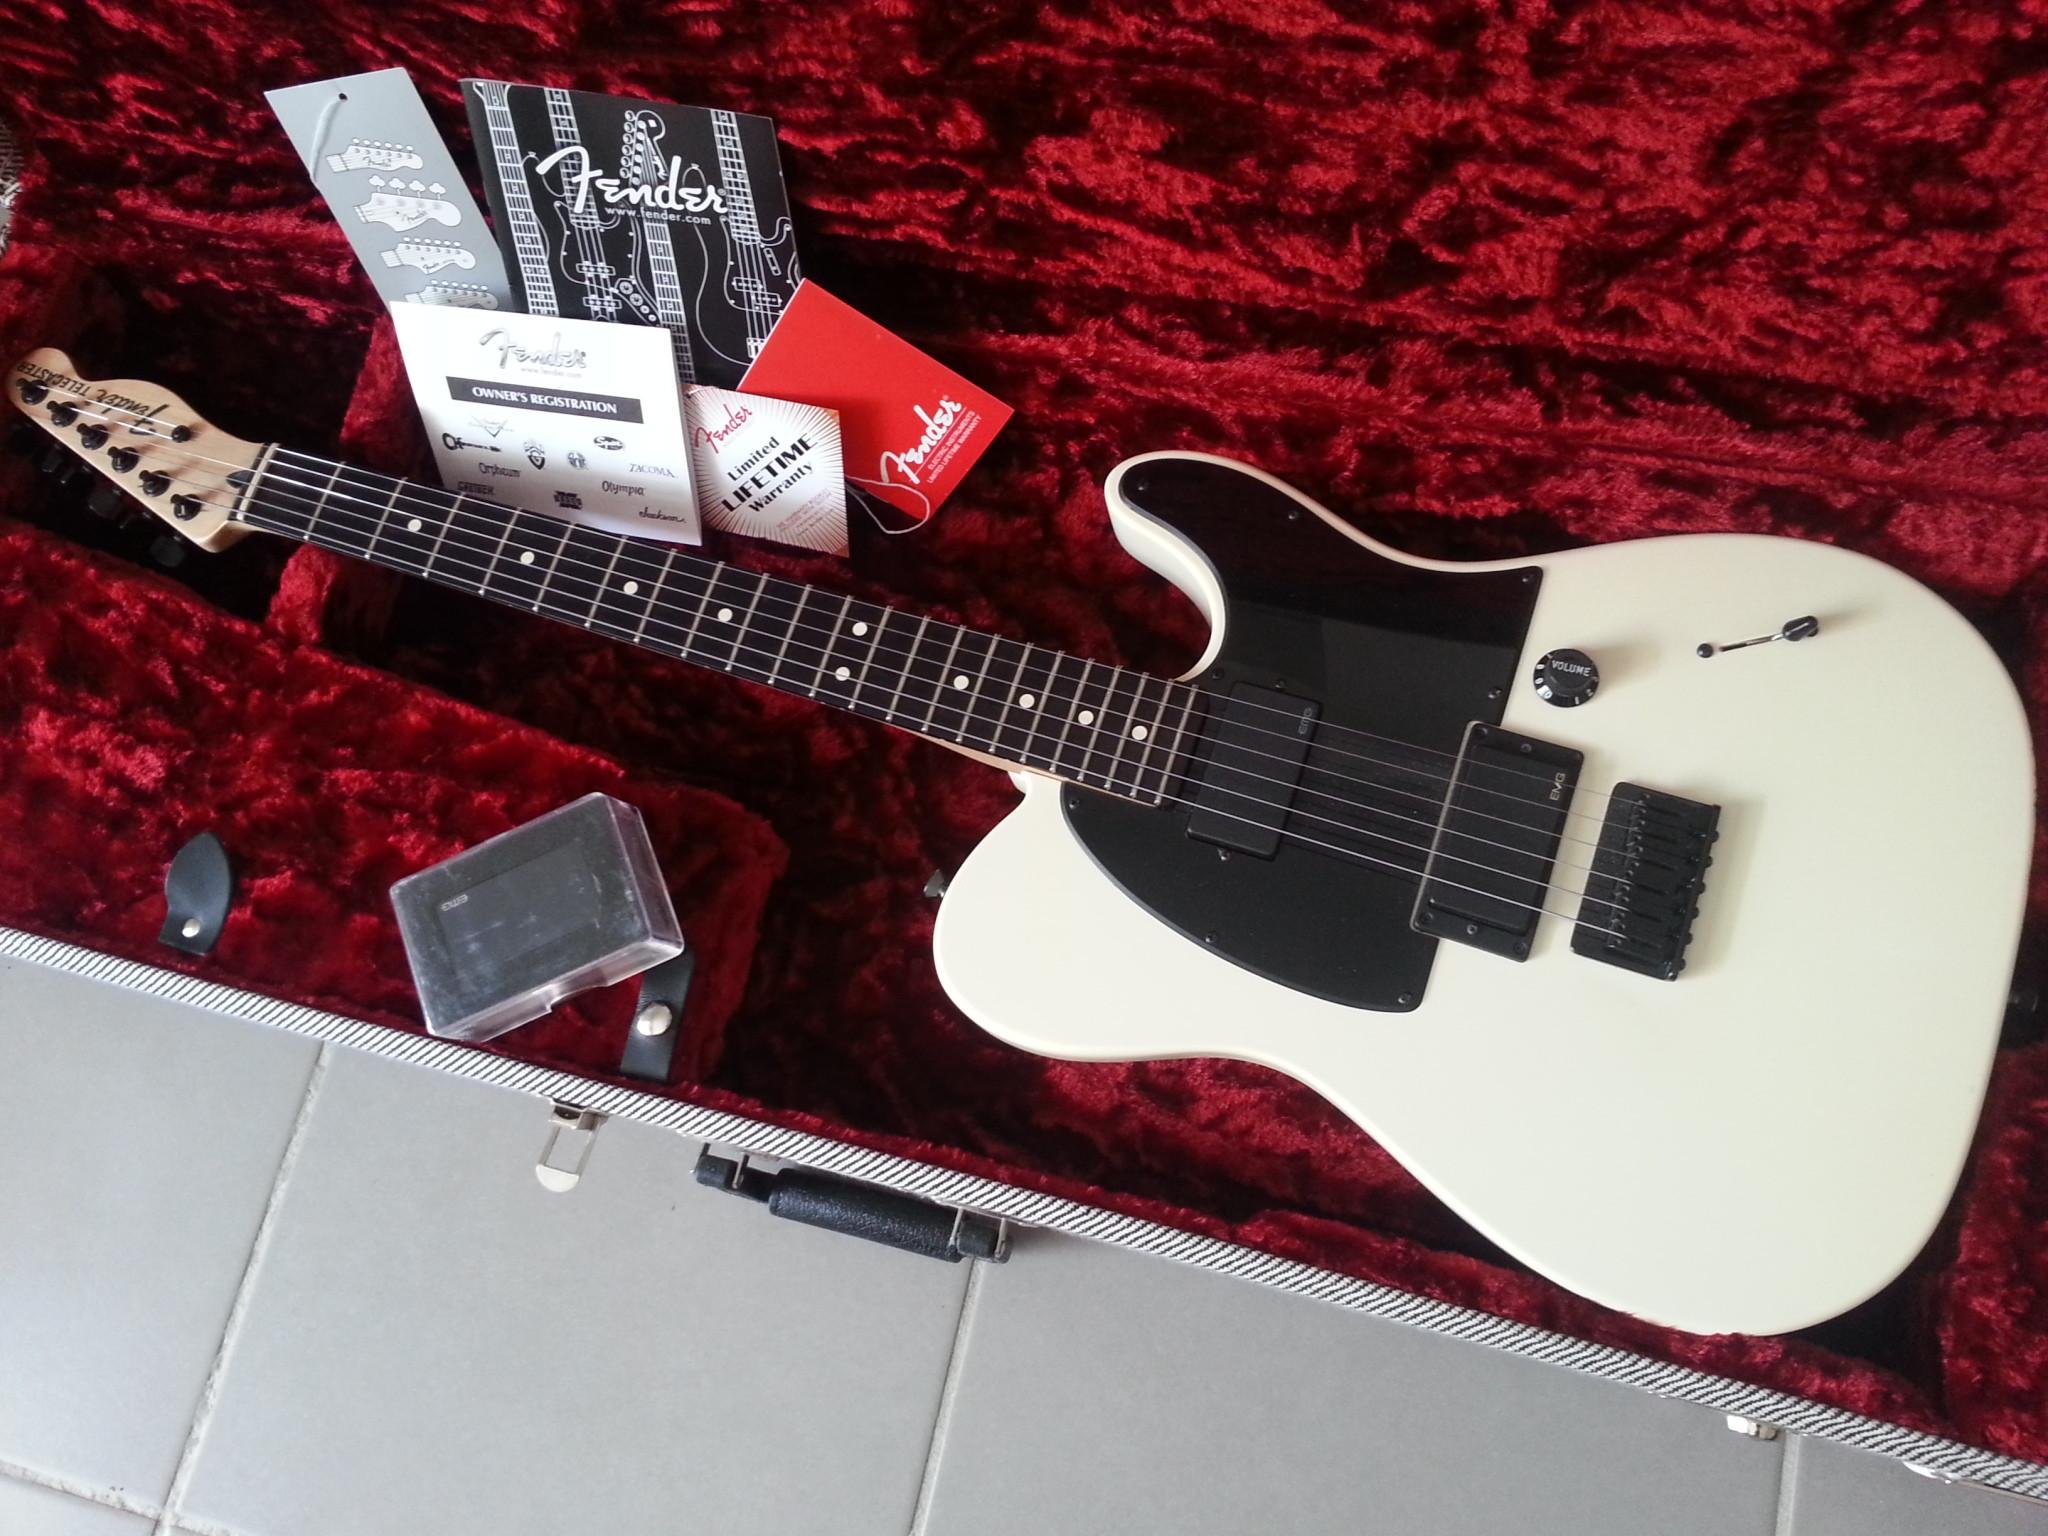 Fender Jim Root Telecaster image (#658120) – Audiofanzine